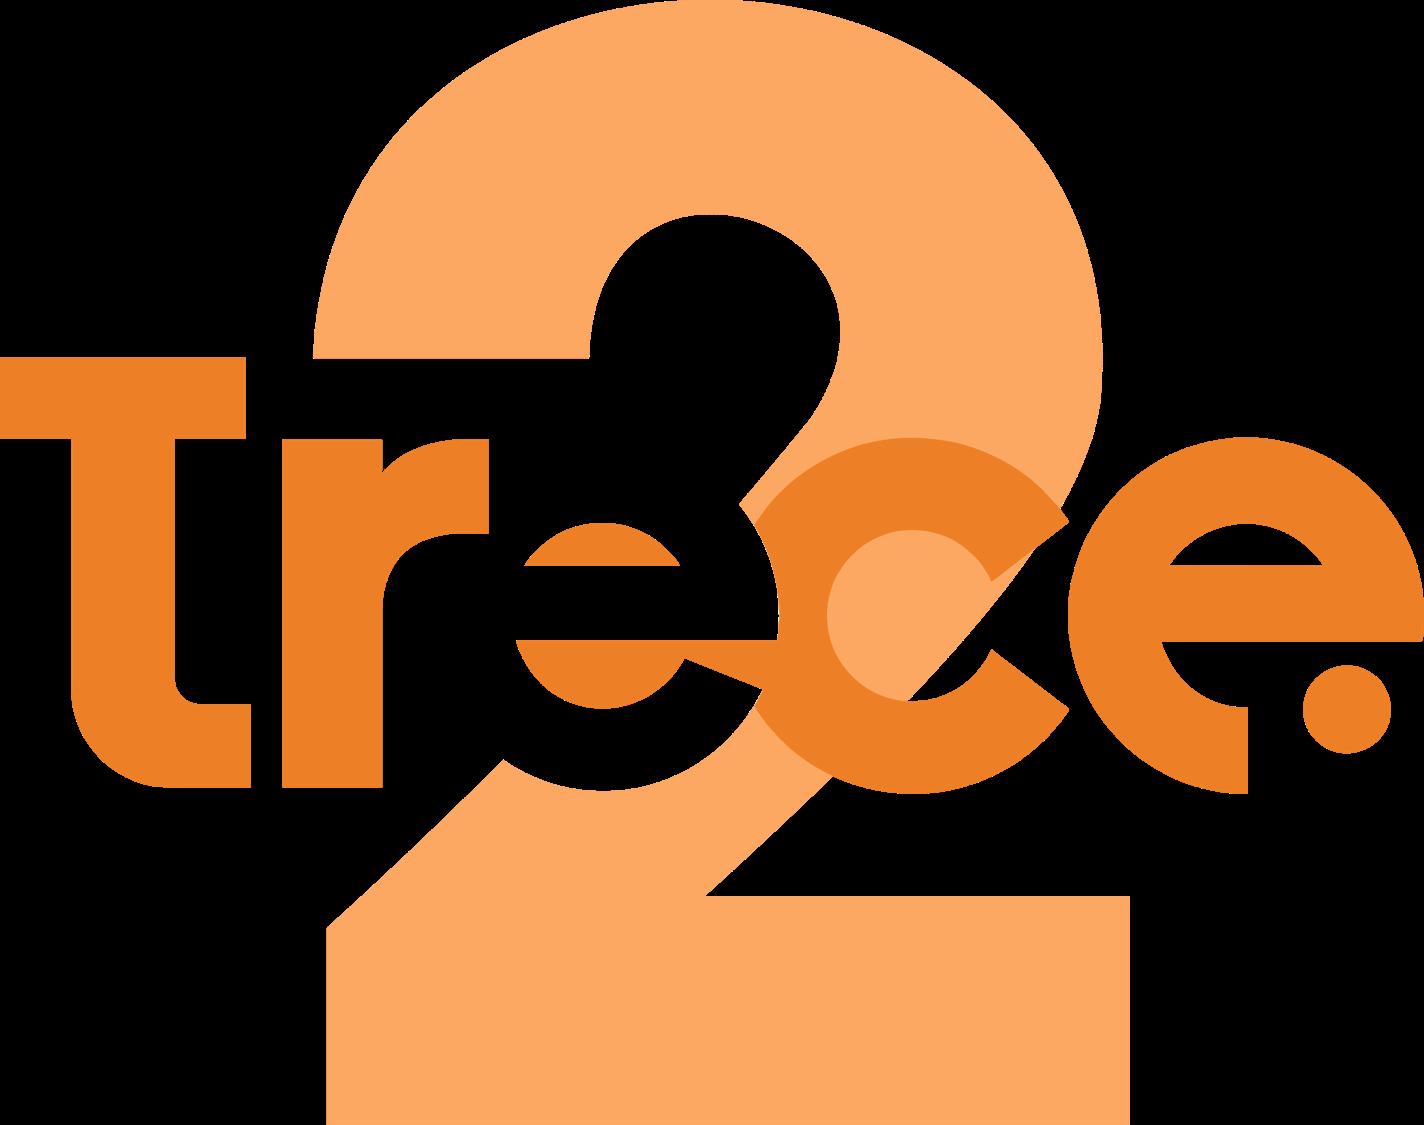 Trece+ (Colombia)